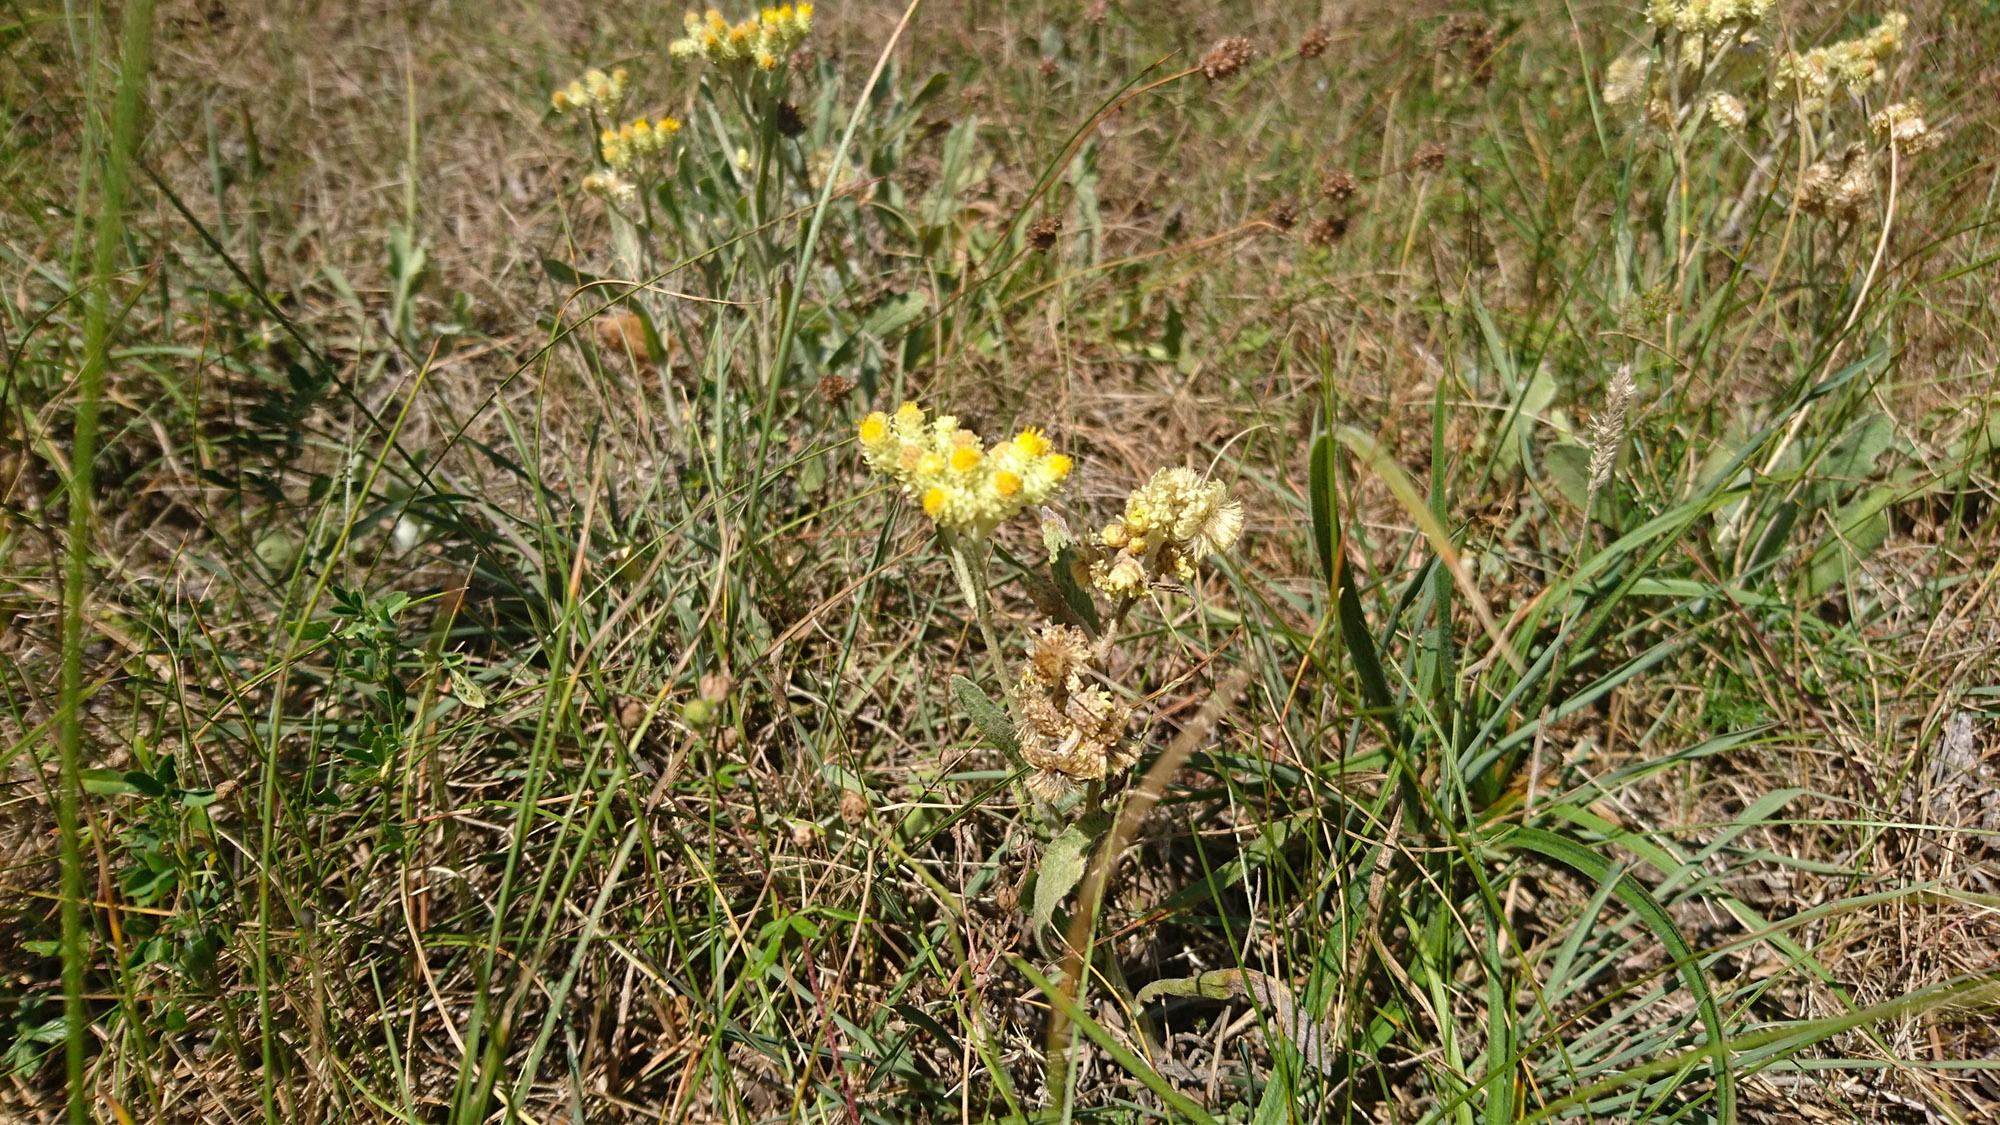 I Brösarps backar trivs den fridlysta hedblomster, Helichrysum arenarium (L.) Moench.